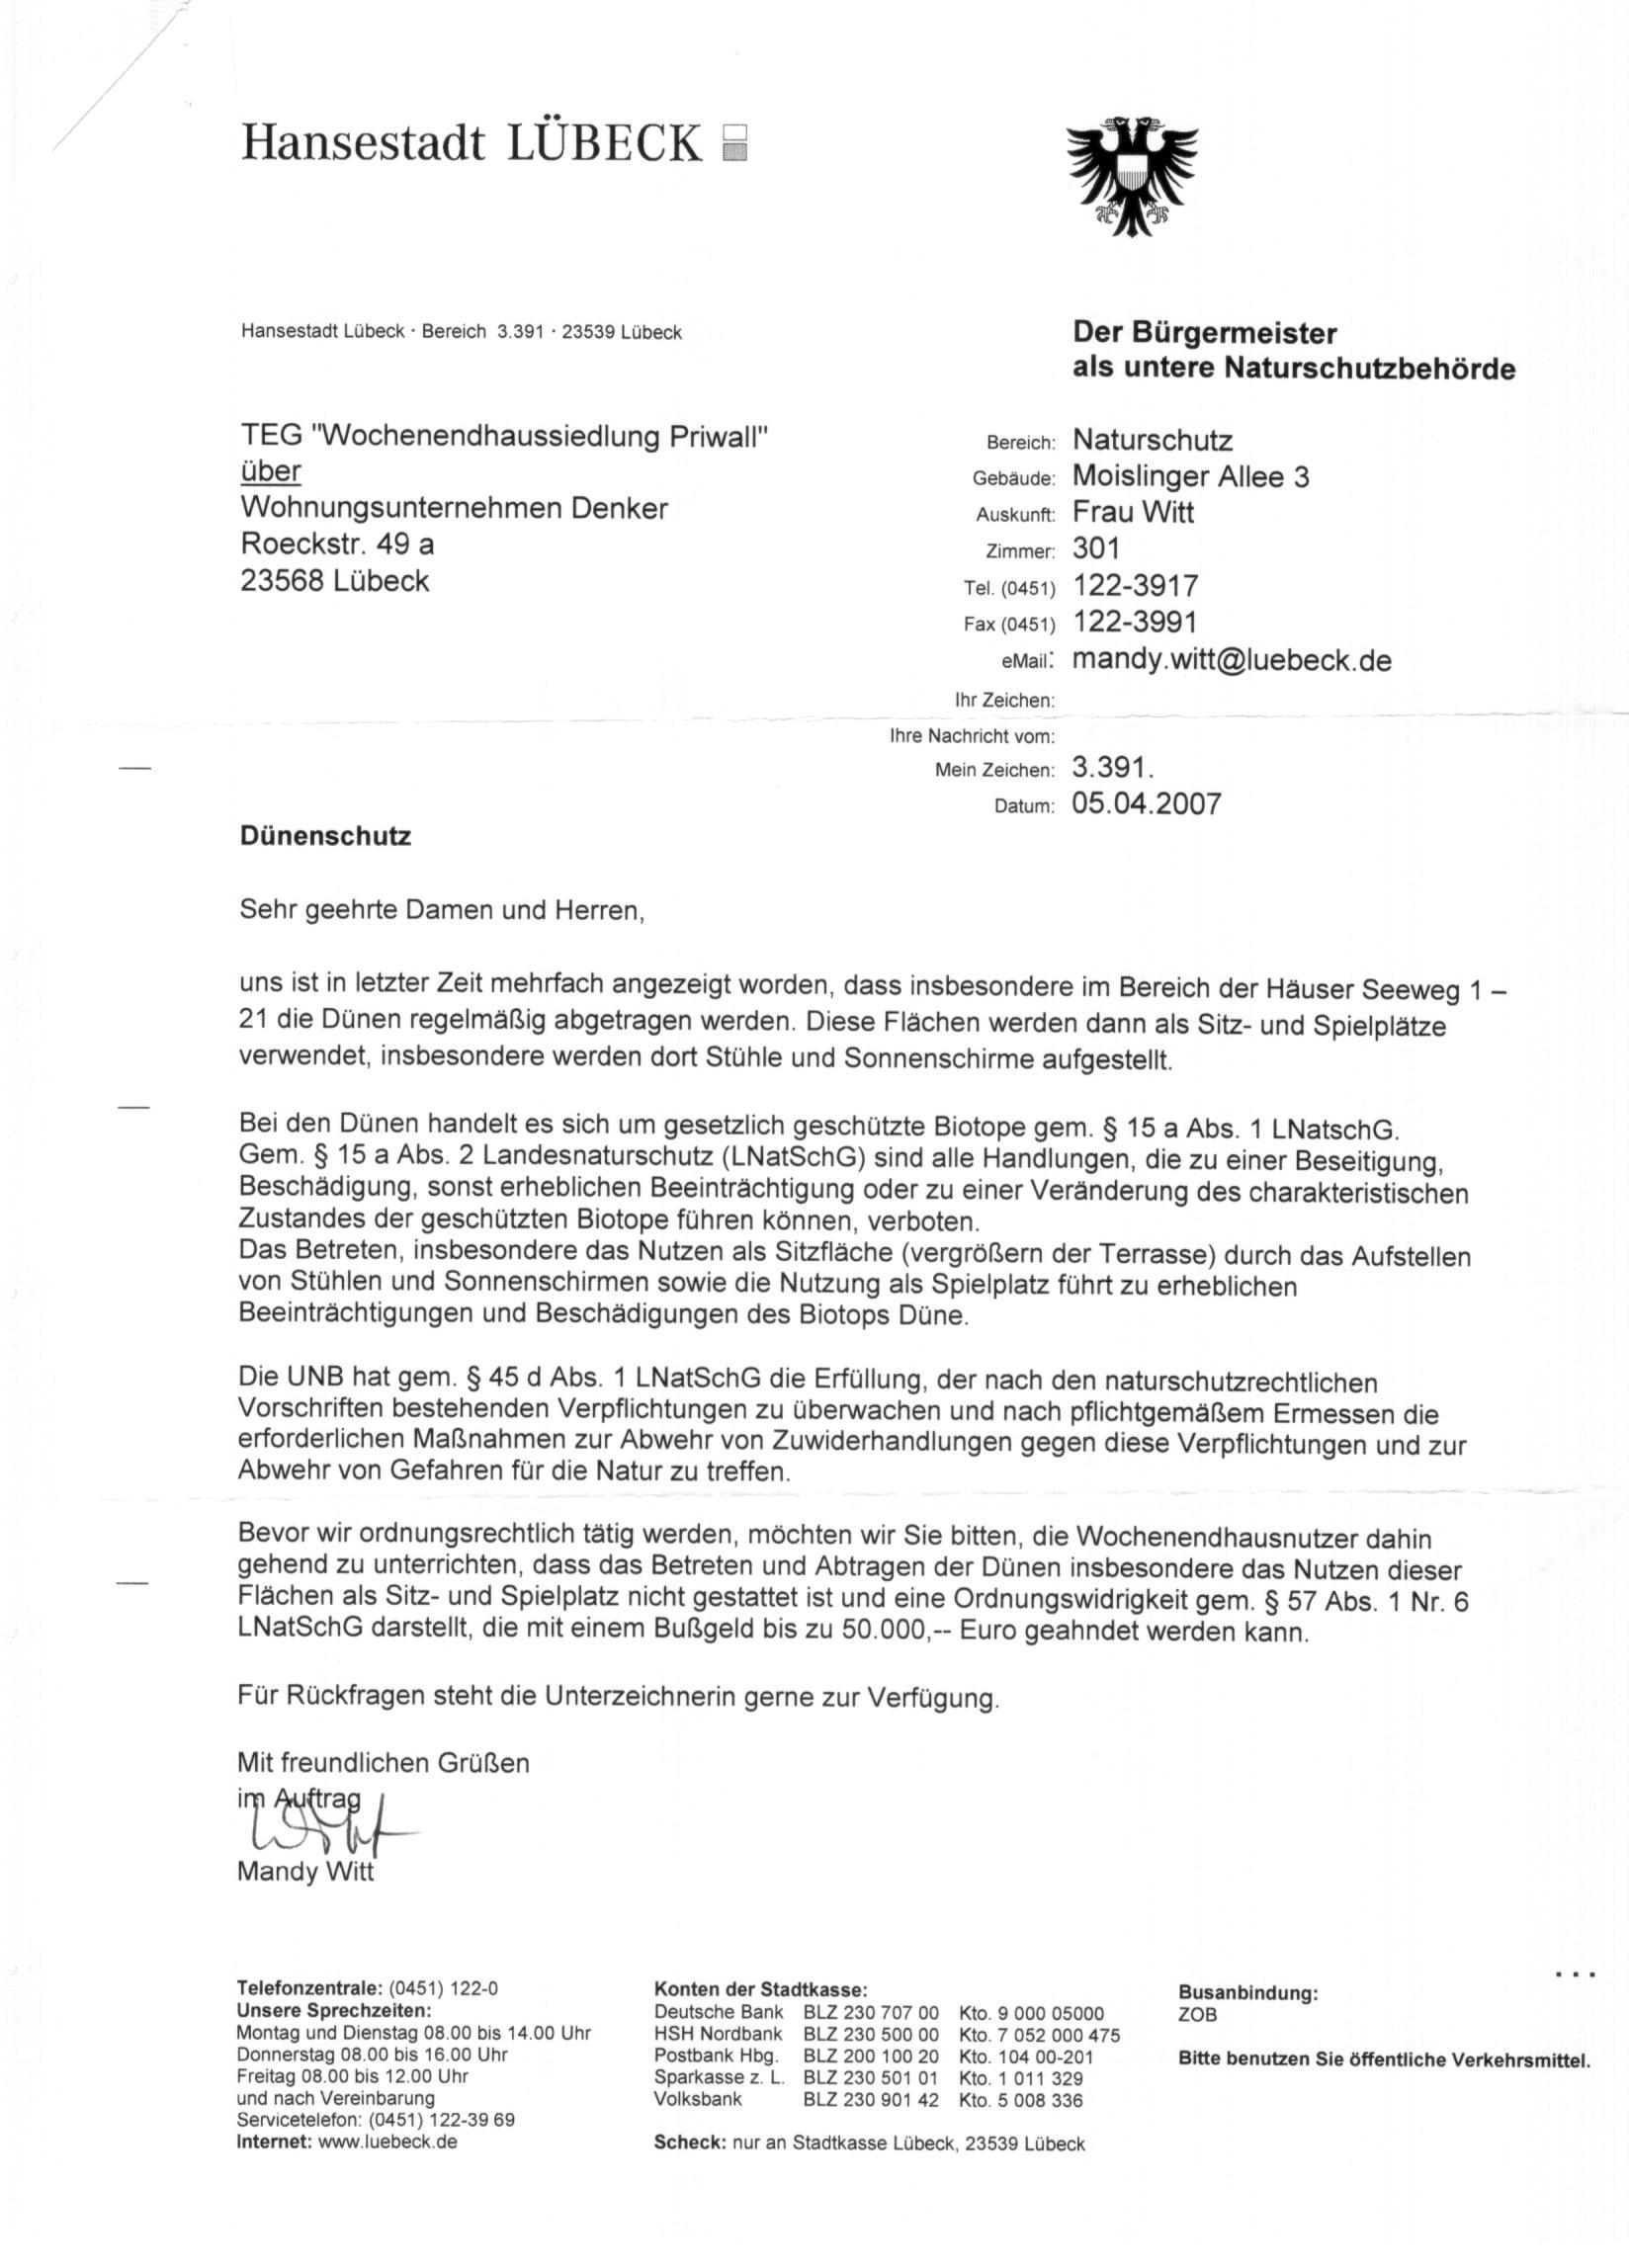 15507 - Protokoll Eigentumerversammlung Muster